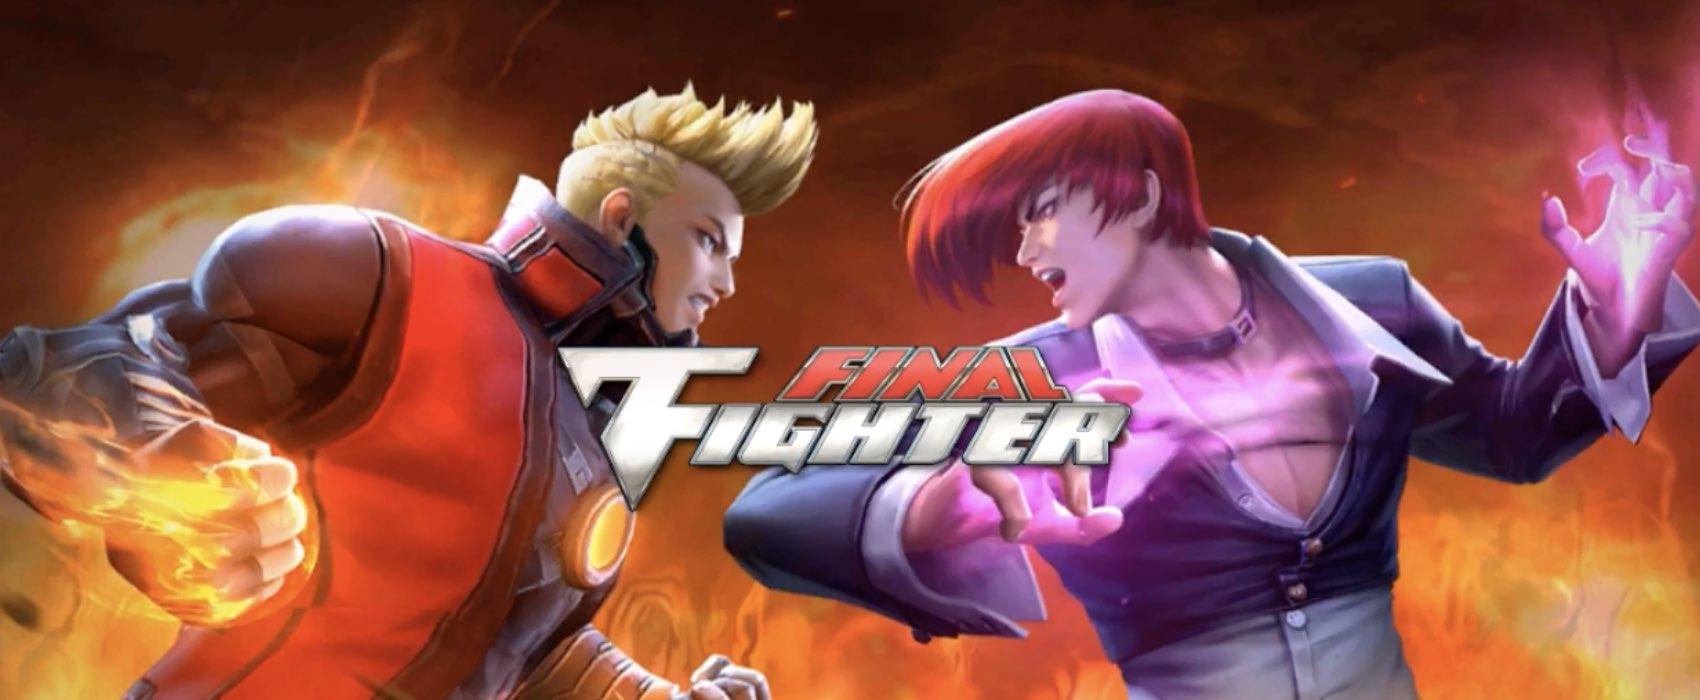 Final Fighter wiki